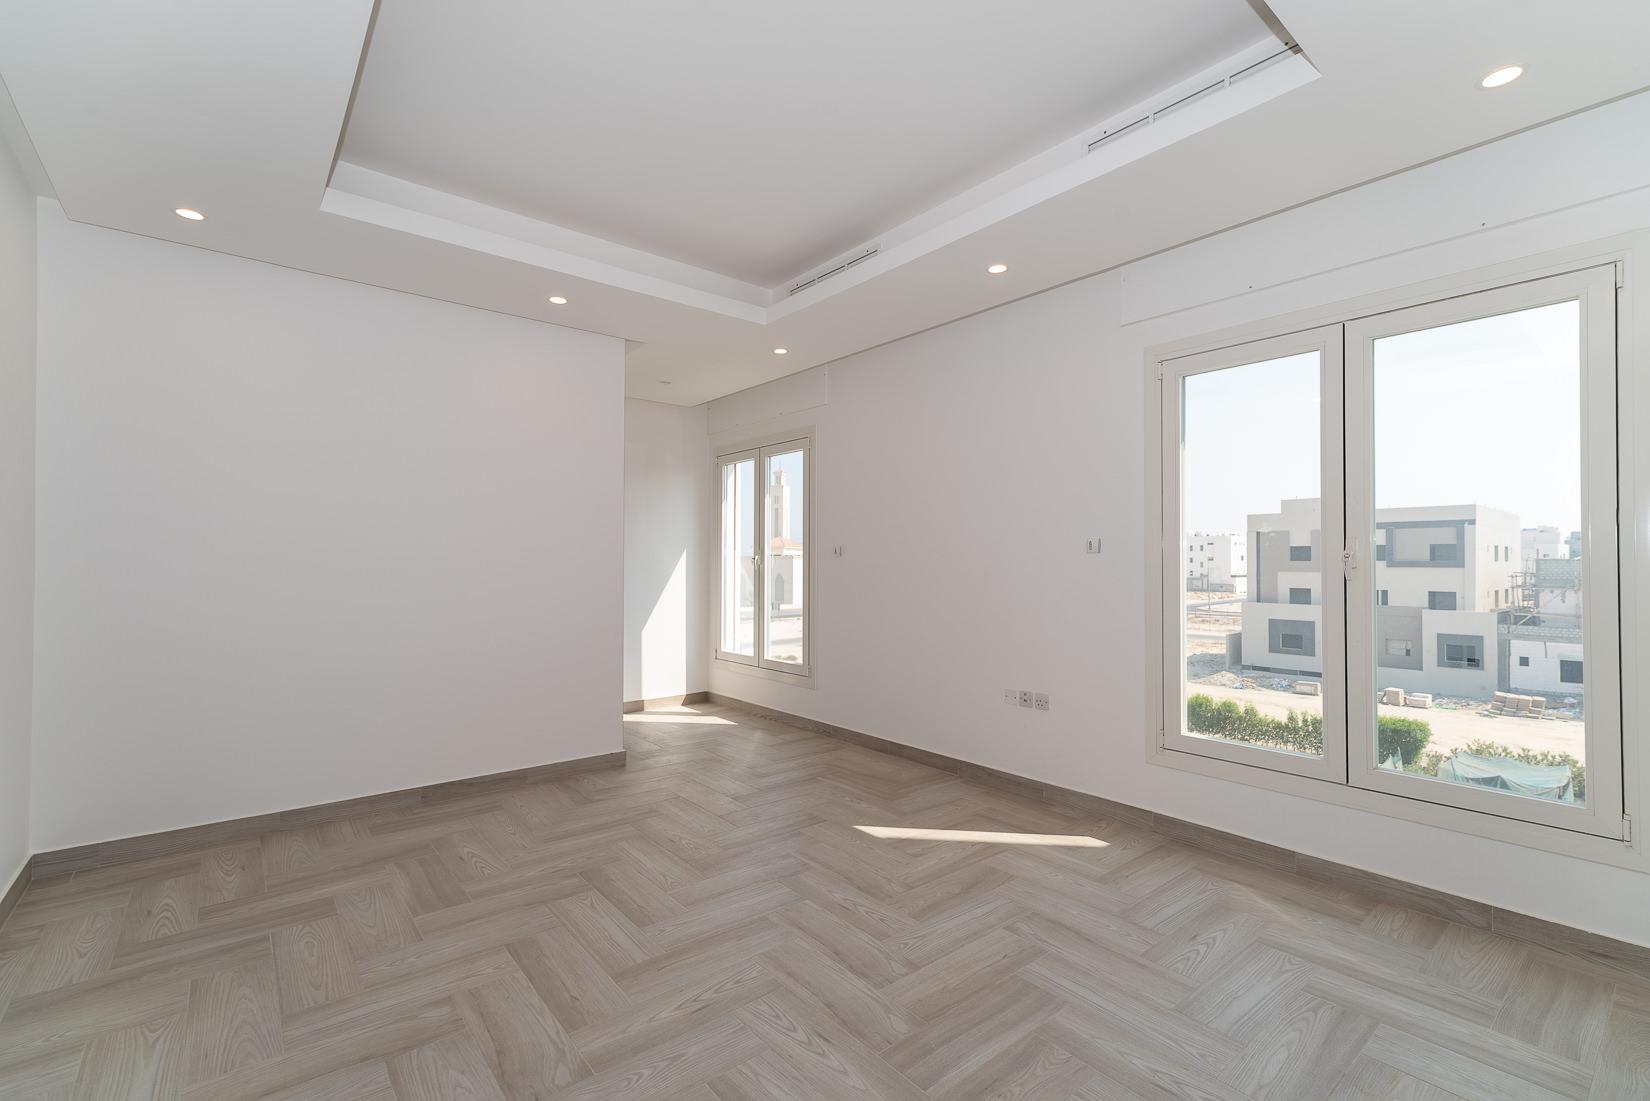 Masayel – brand new, unfurnished apartments